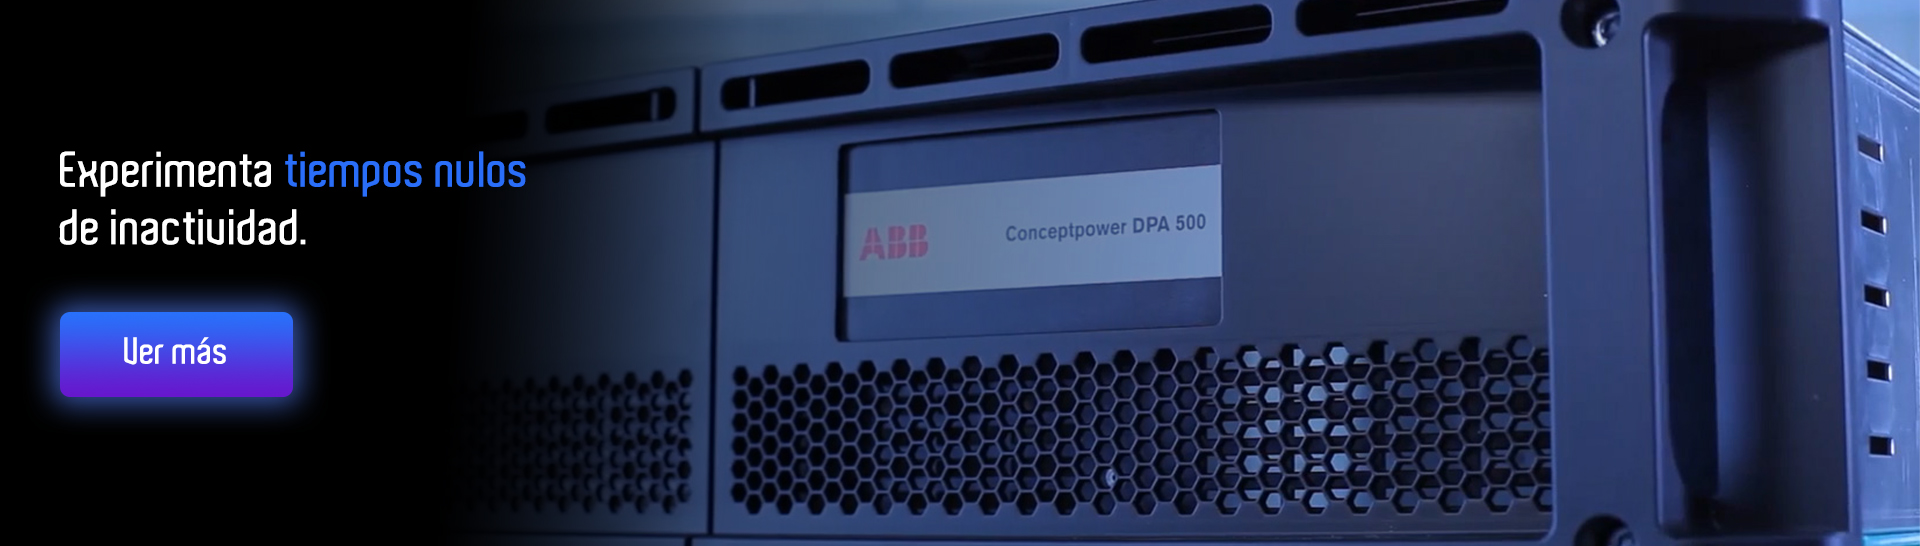 CREXEL UPS -Slider 2 - ABB ConceptDPA 500